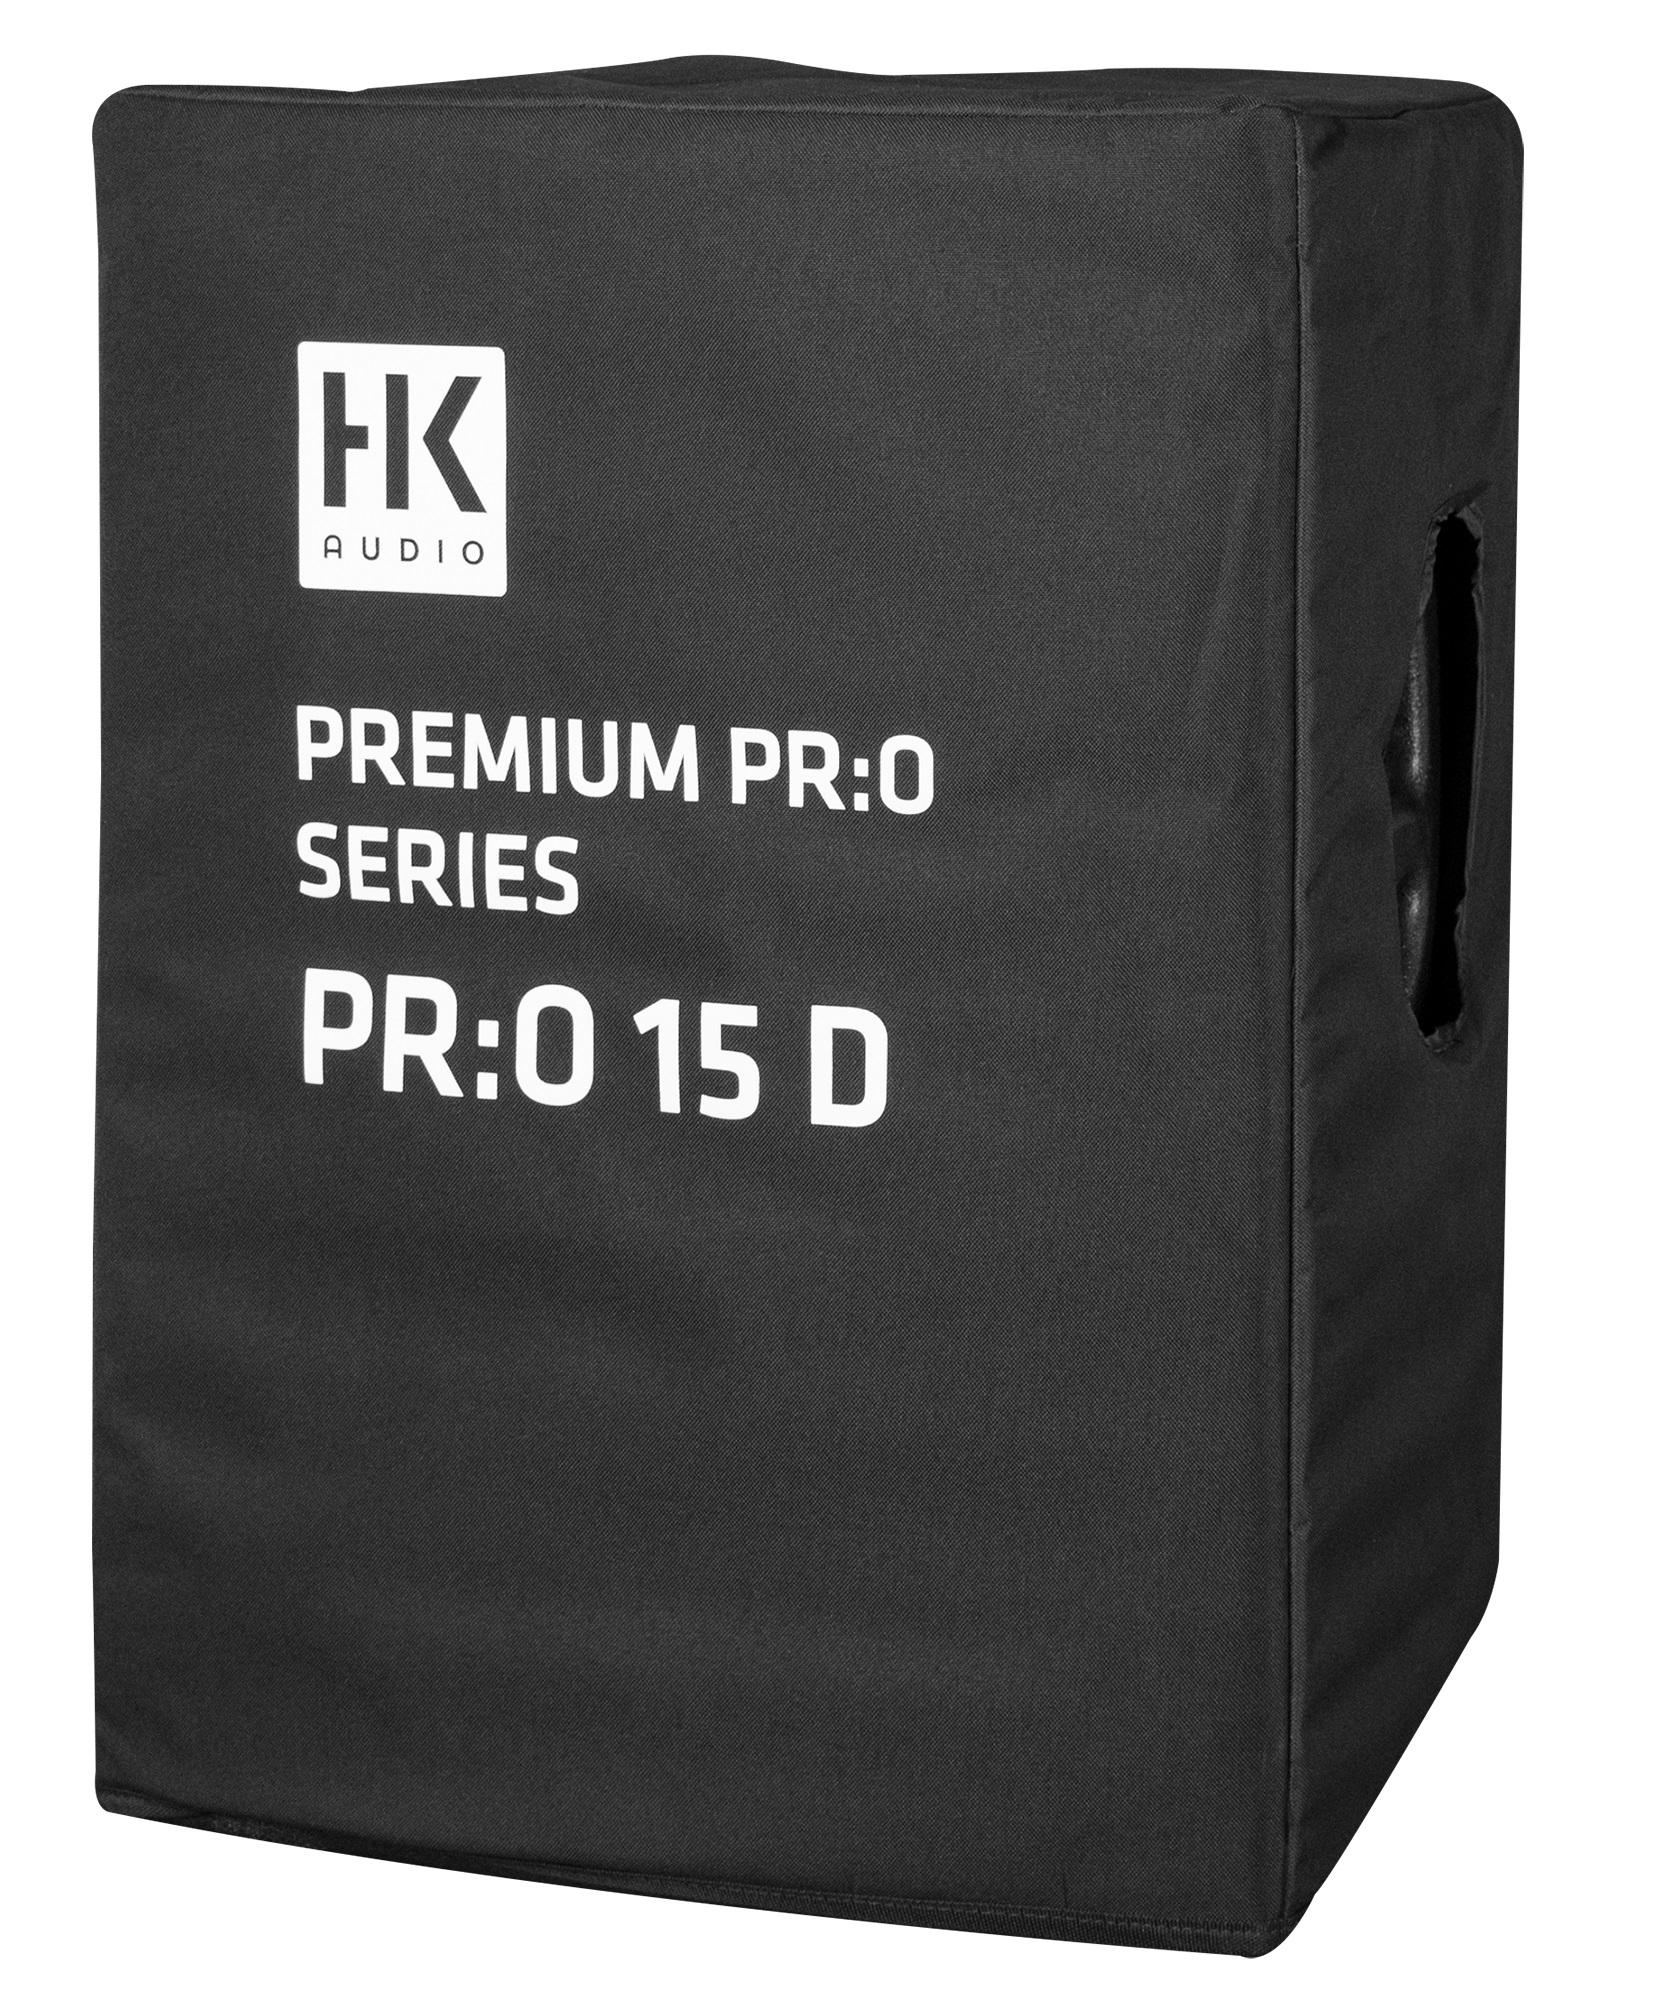 HK Audio PR:O 15 D cover